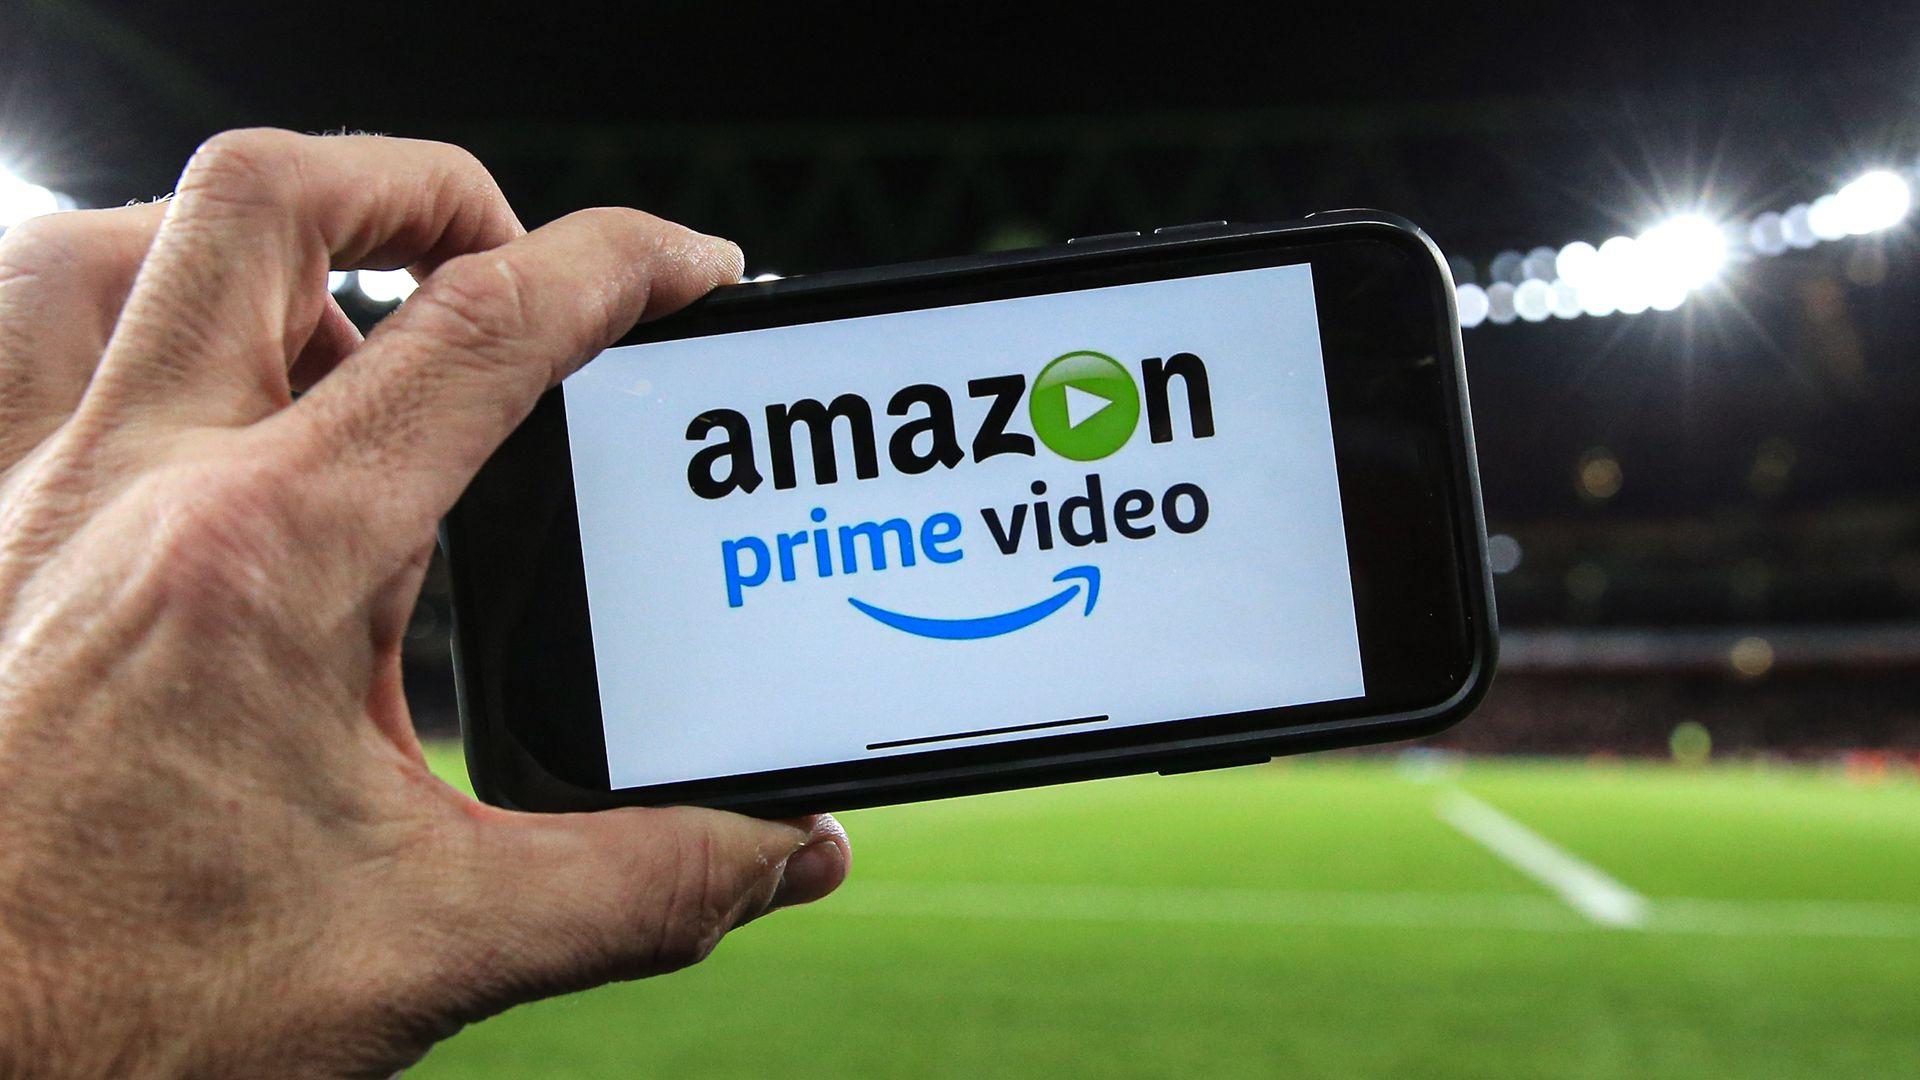 Amazon Prime showing the match live via the internet during the Premier League